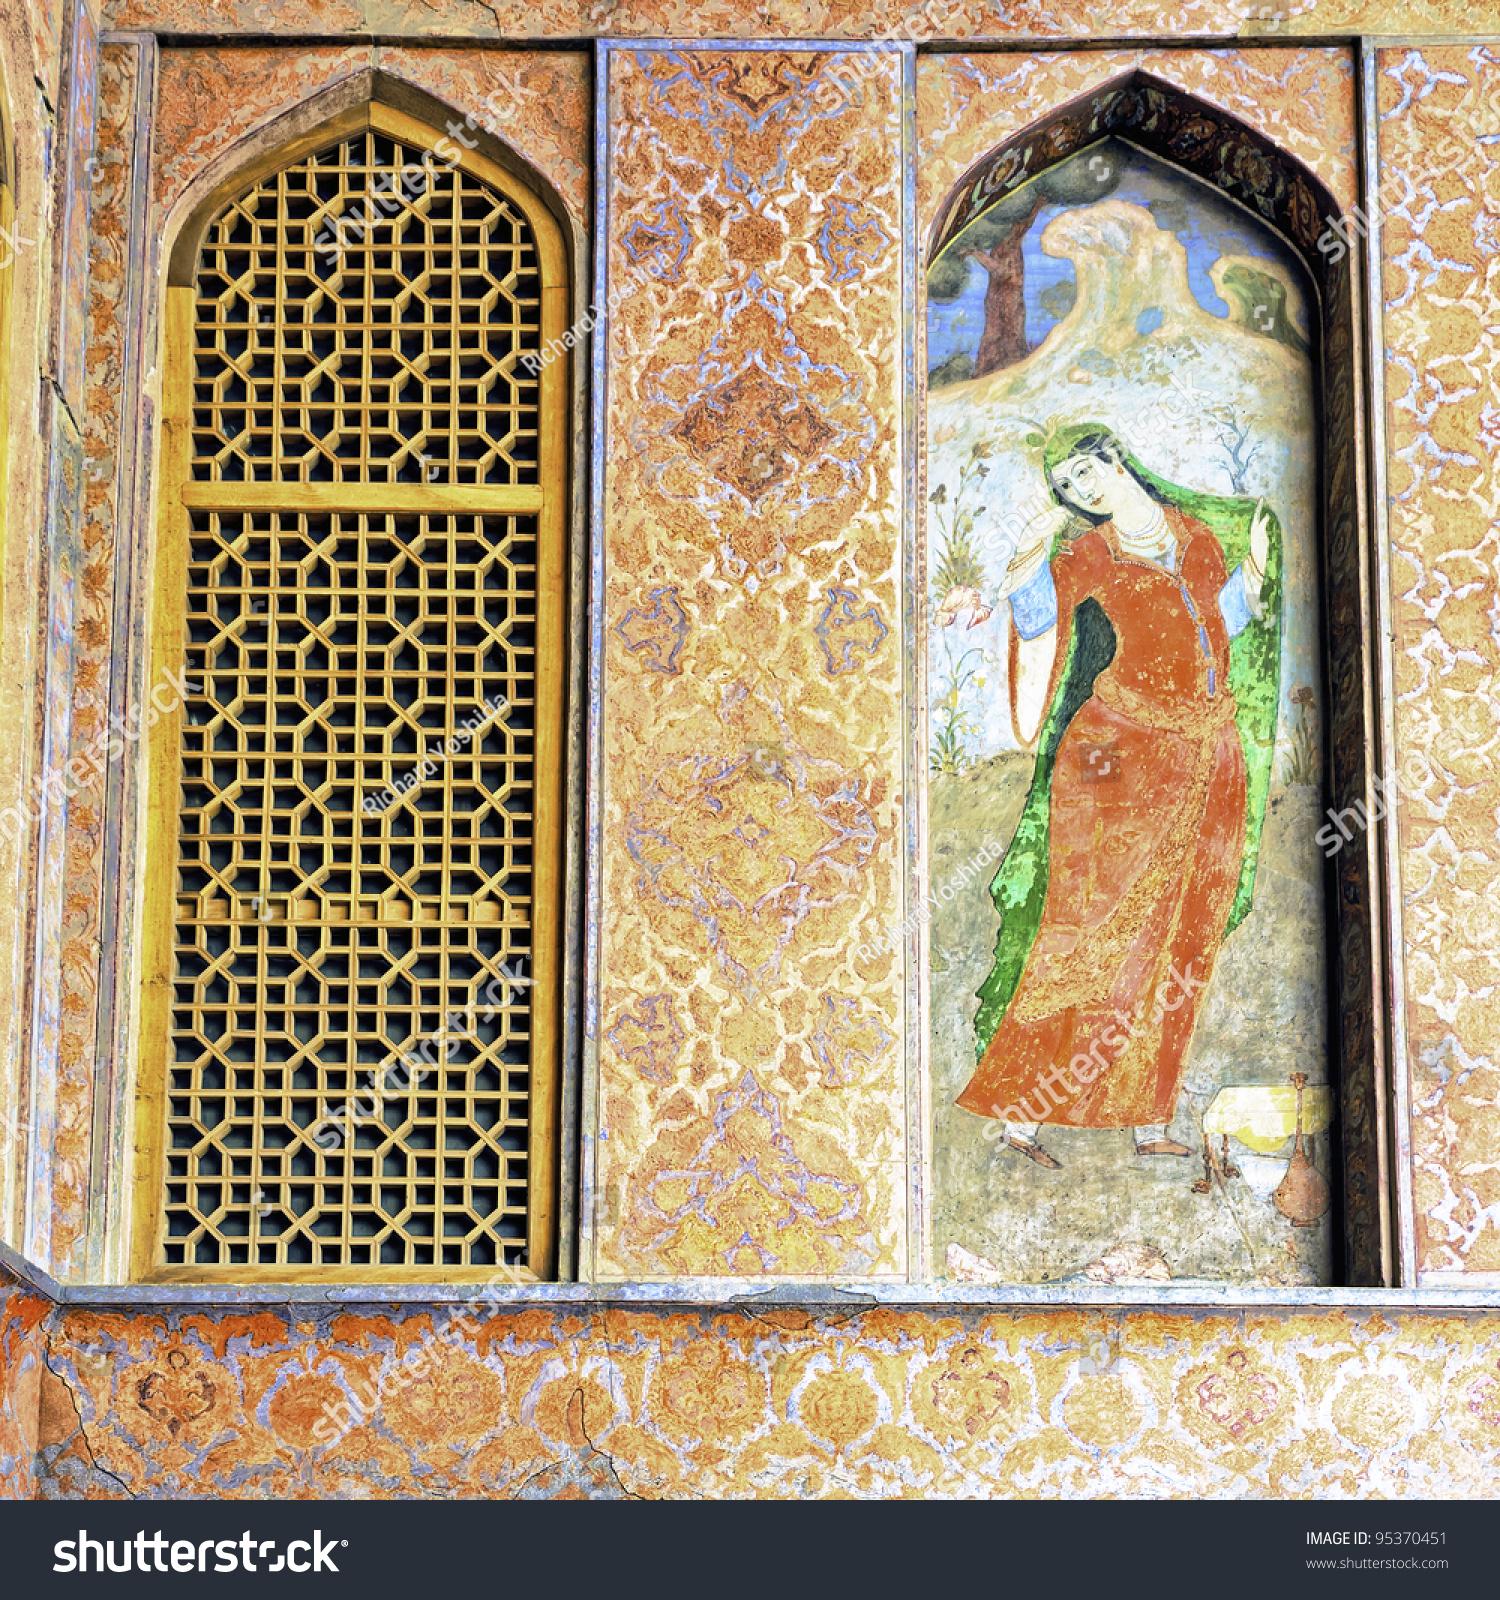 Wall Painting Ali Qapu Isfahan Iran Stock Photo (Edit Now)- Shutterstock